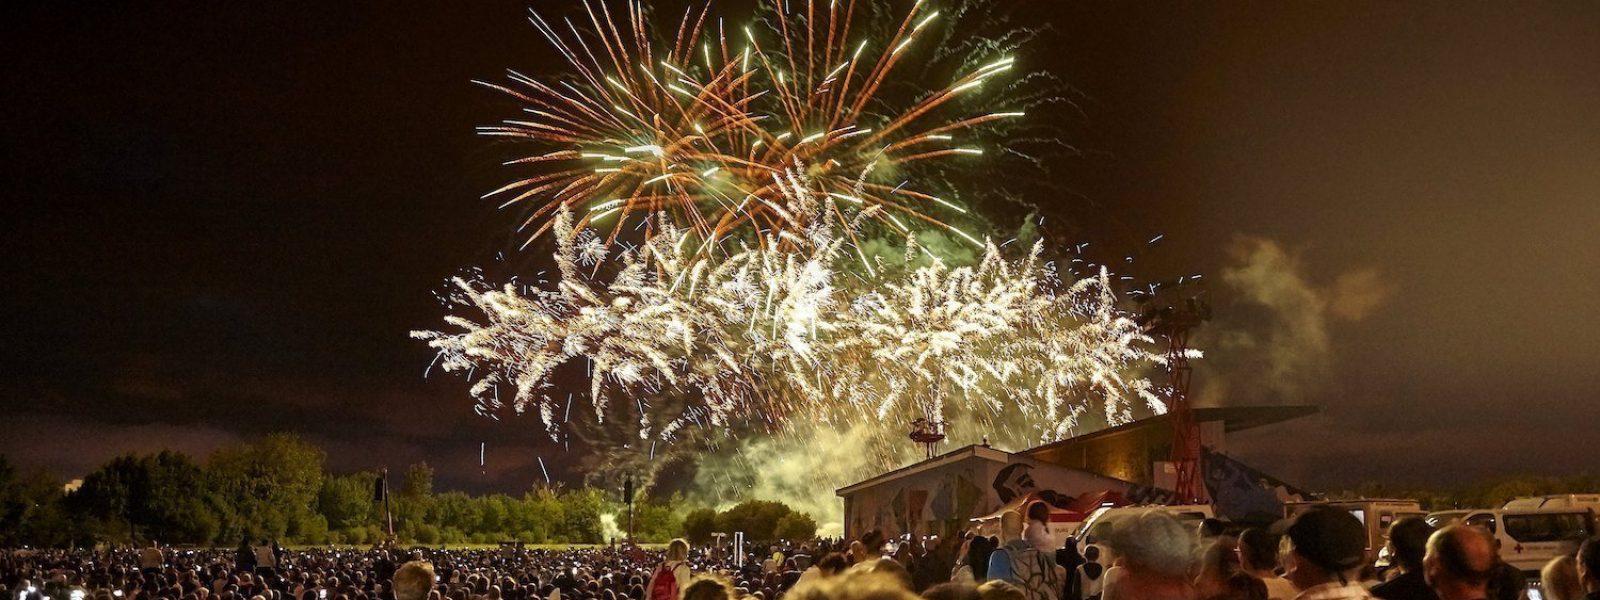 Feu d'artifice du 14 juillet à Rennes en Bretagne